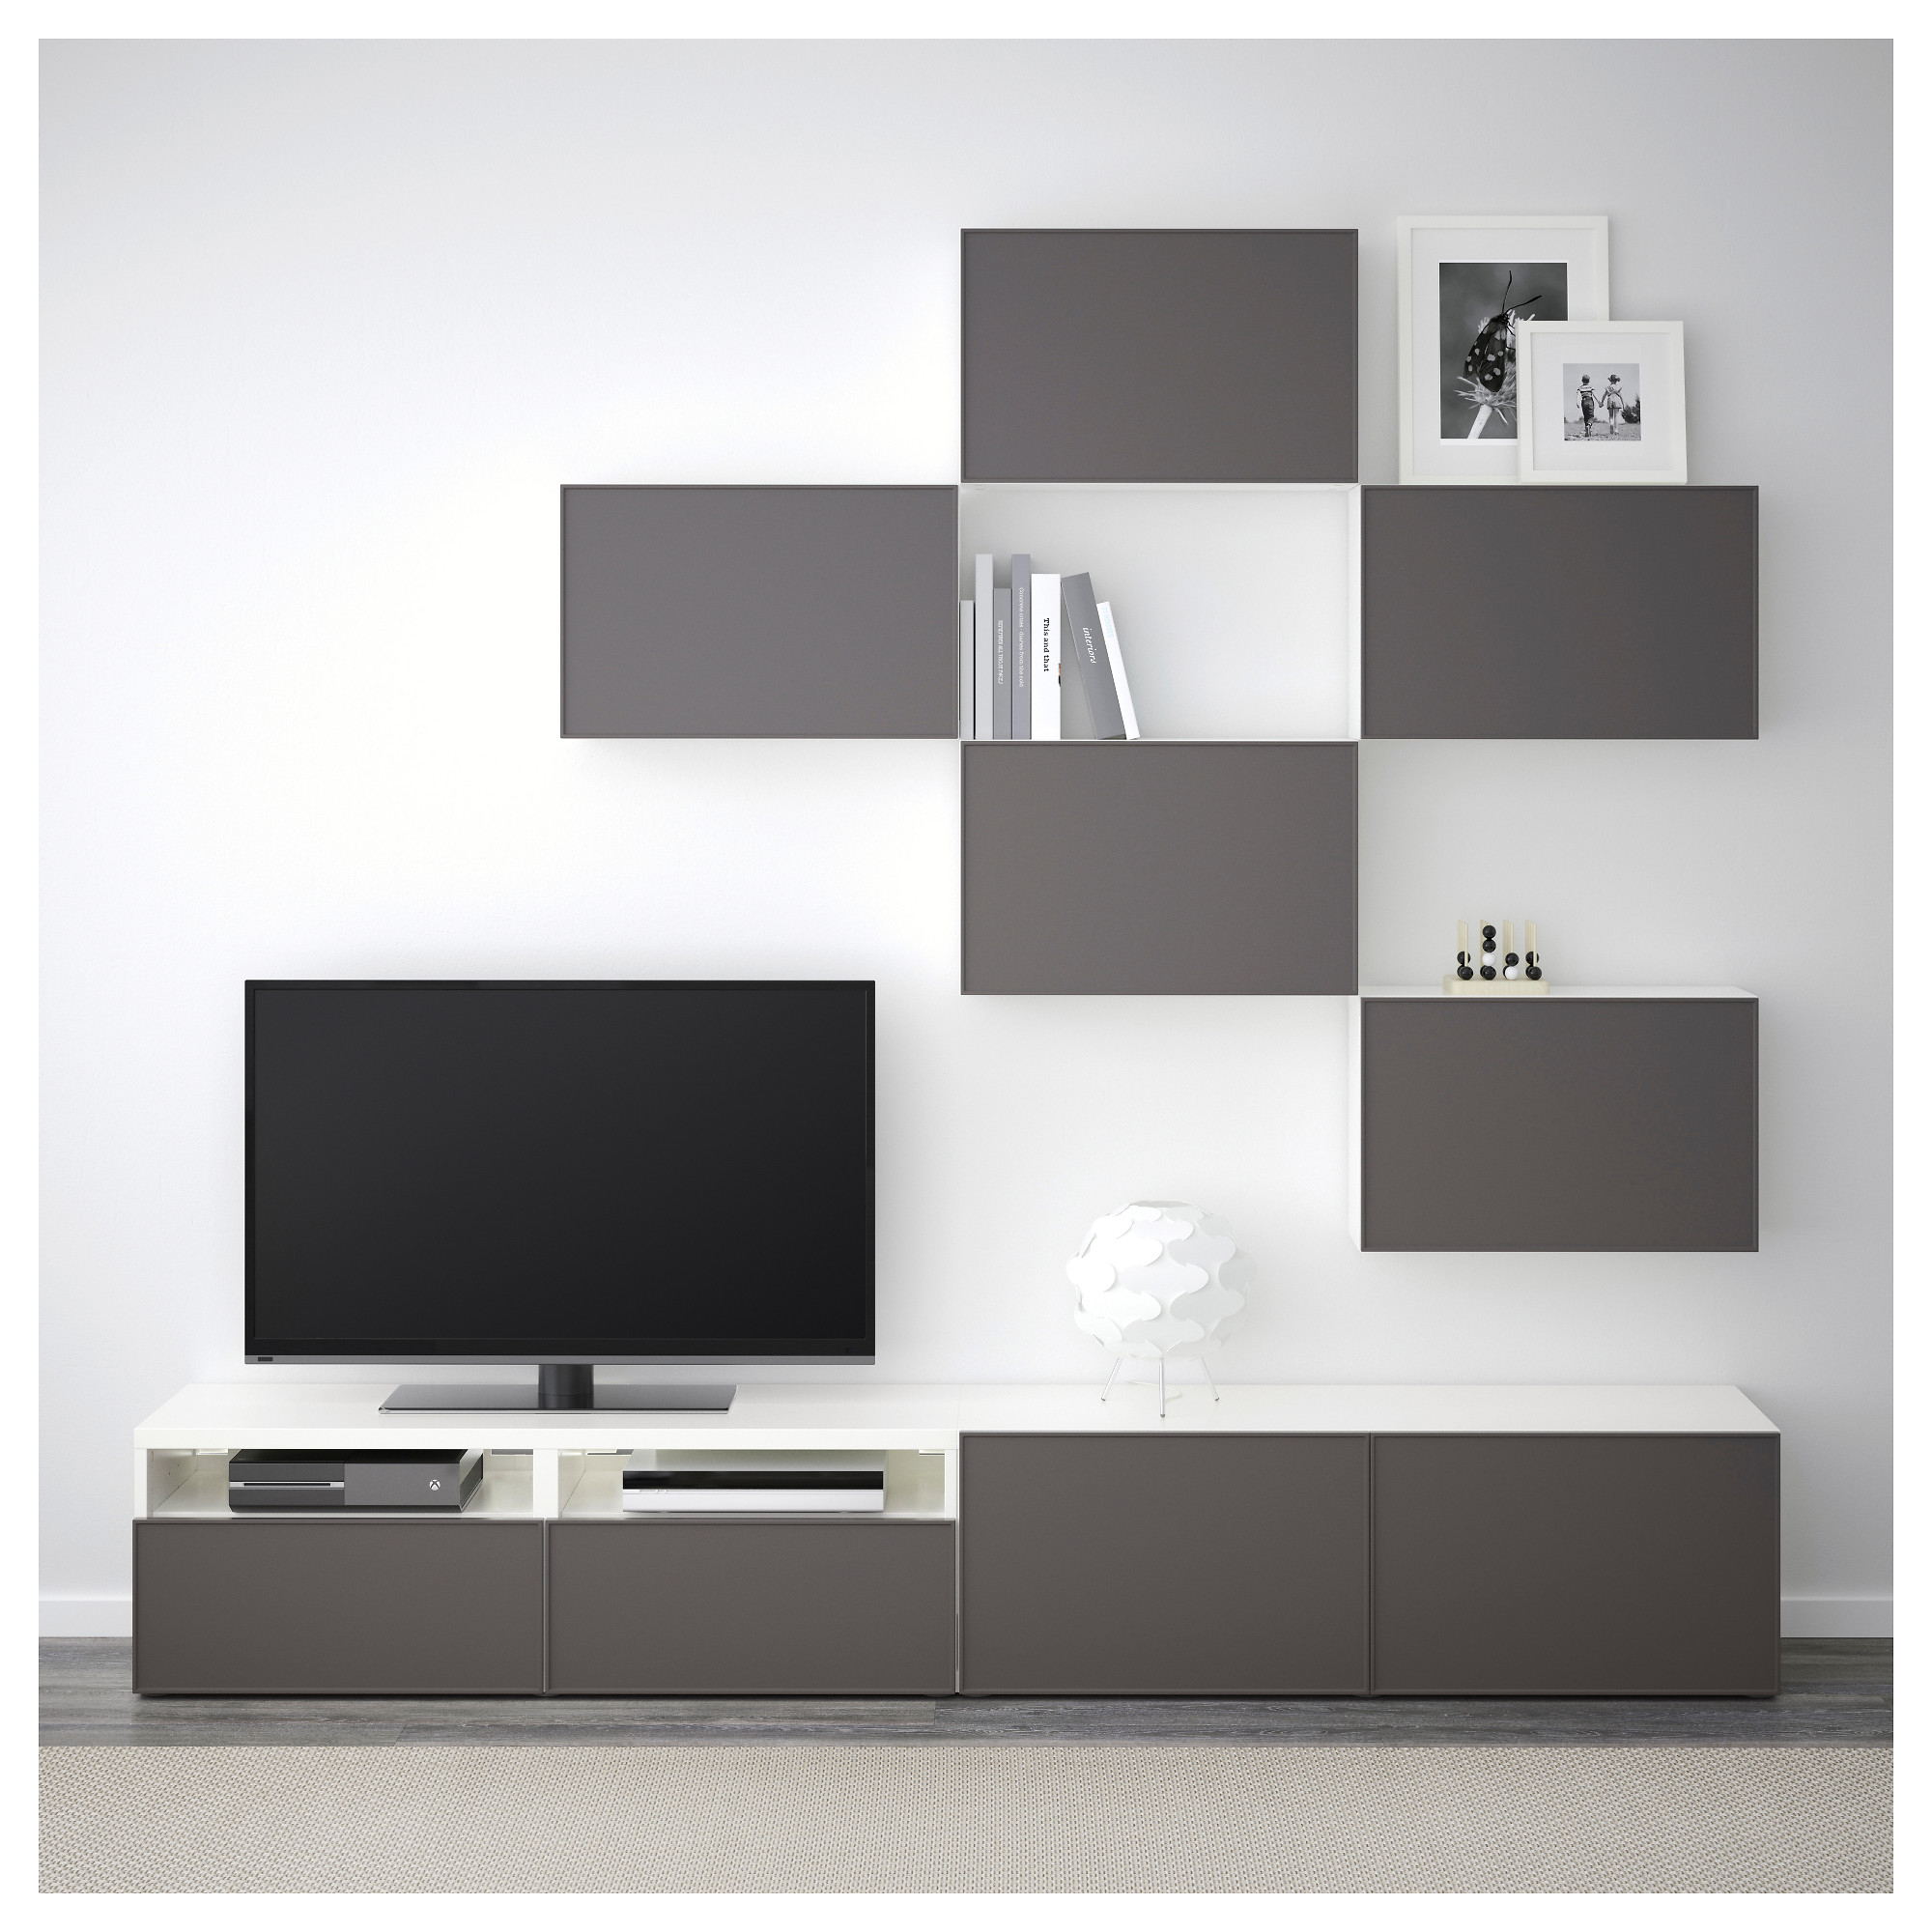 Шкаф для ТВ, комбинация БЕСТО темно-серый артикуль № 292.516.44 в наличии. Онлайн каталог IKEA РБ. Быстрая доставка и установка.